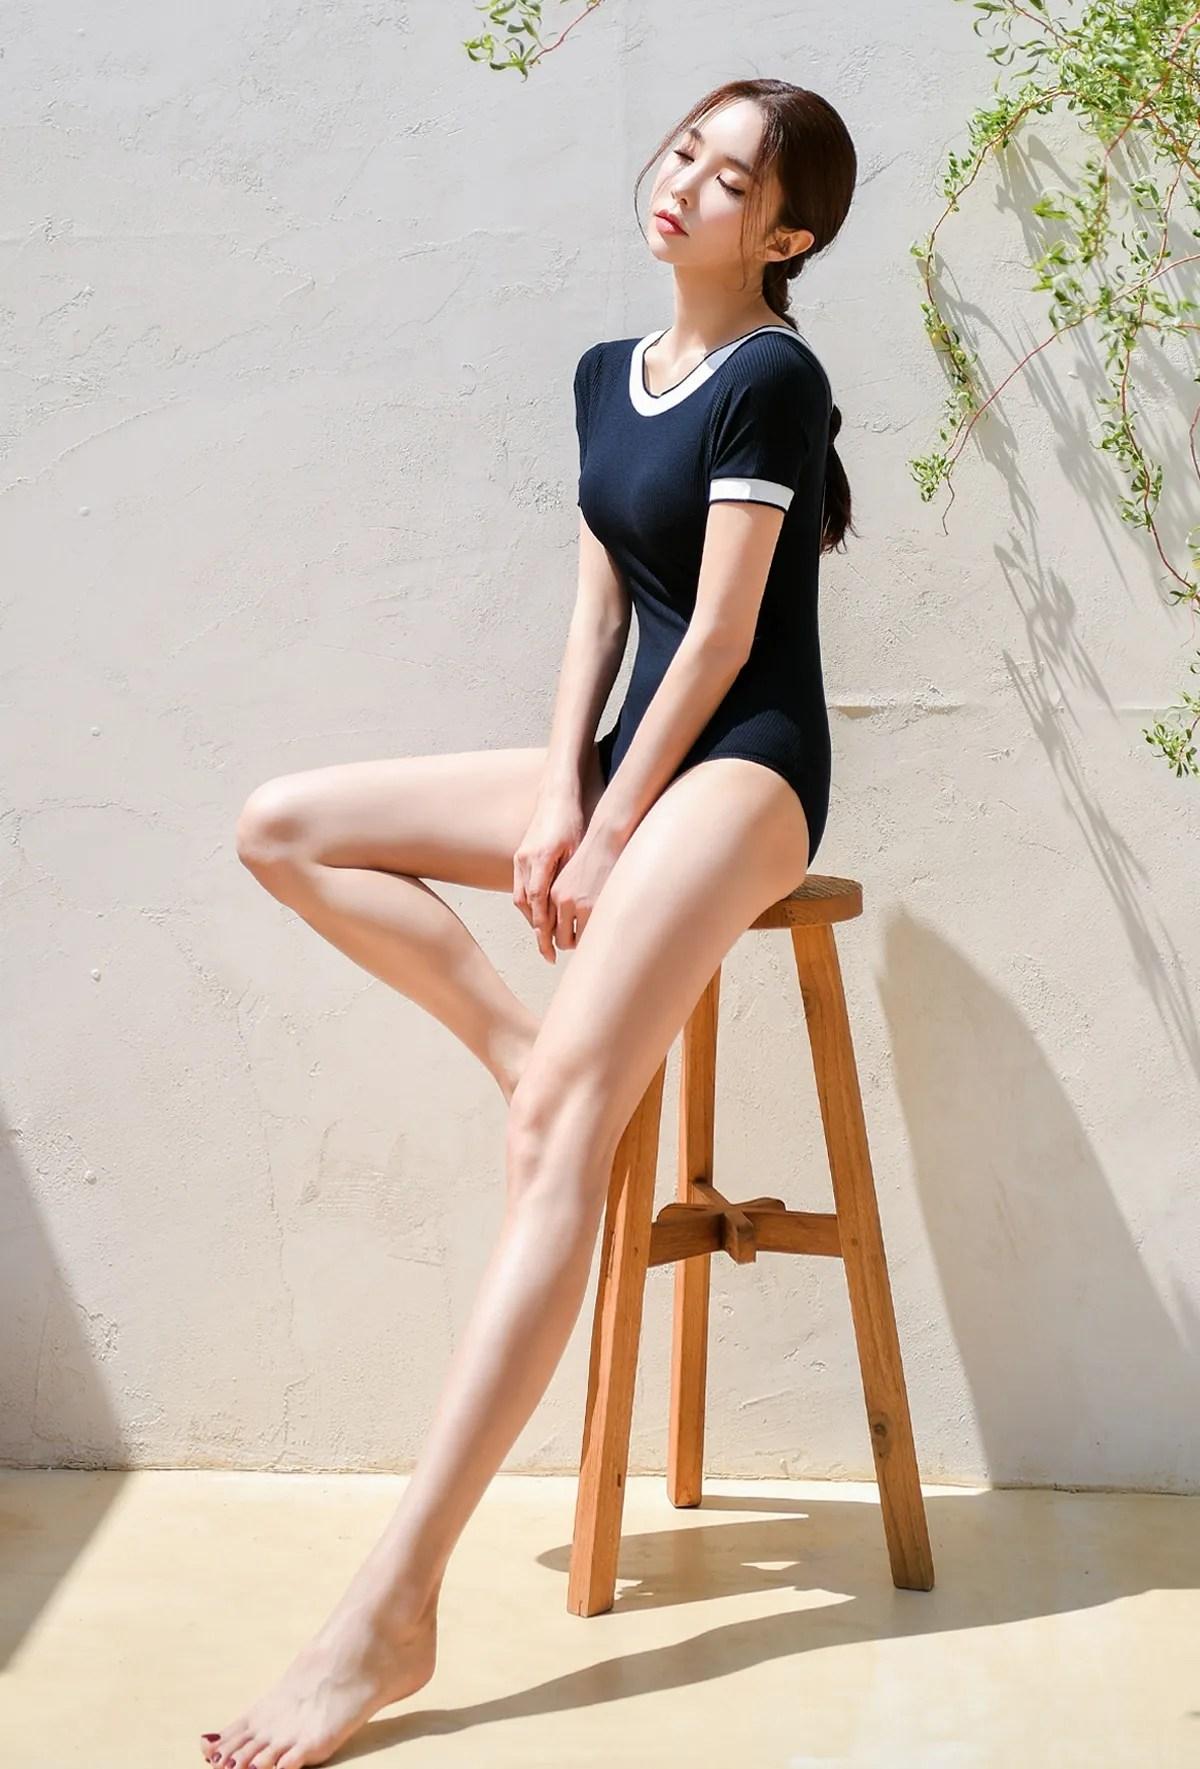 Park Suyeon / vendis / May 2021 / Sundress & Monokini Photoshoot Part 1